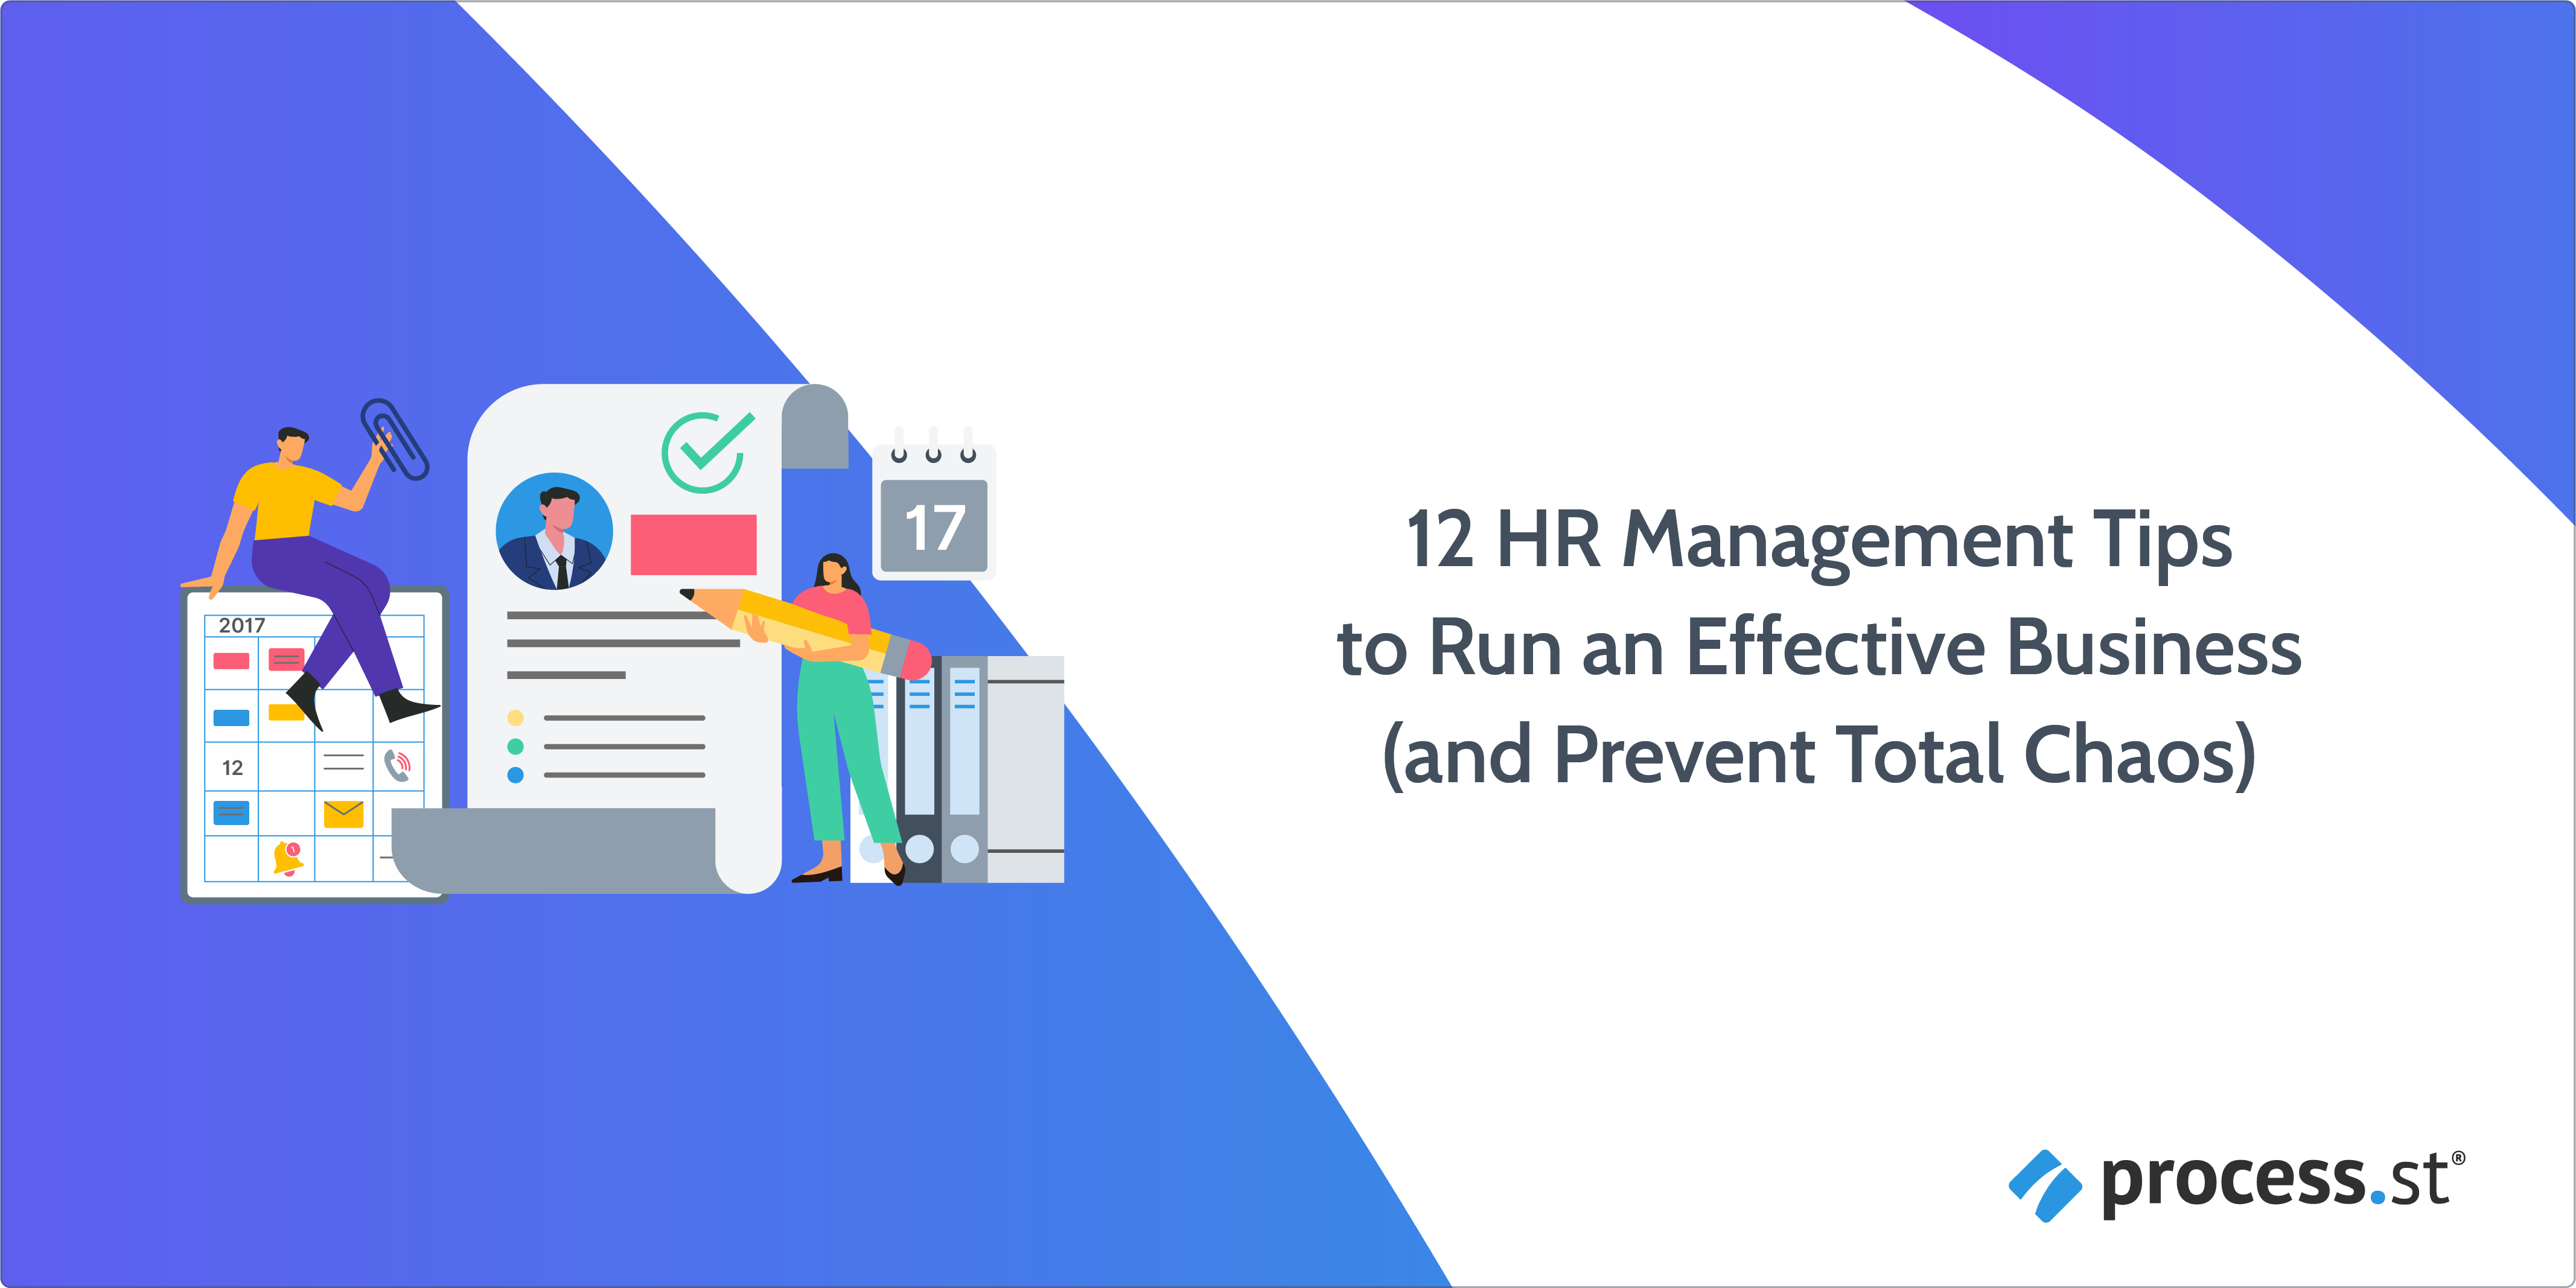 hr management tips